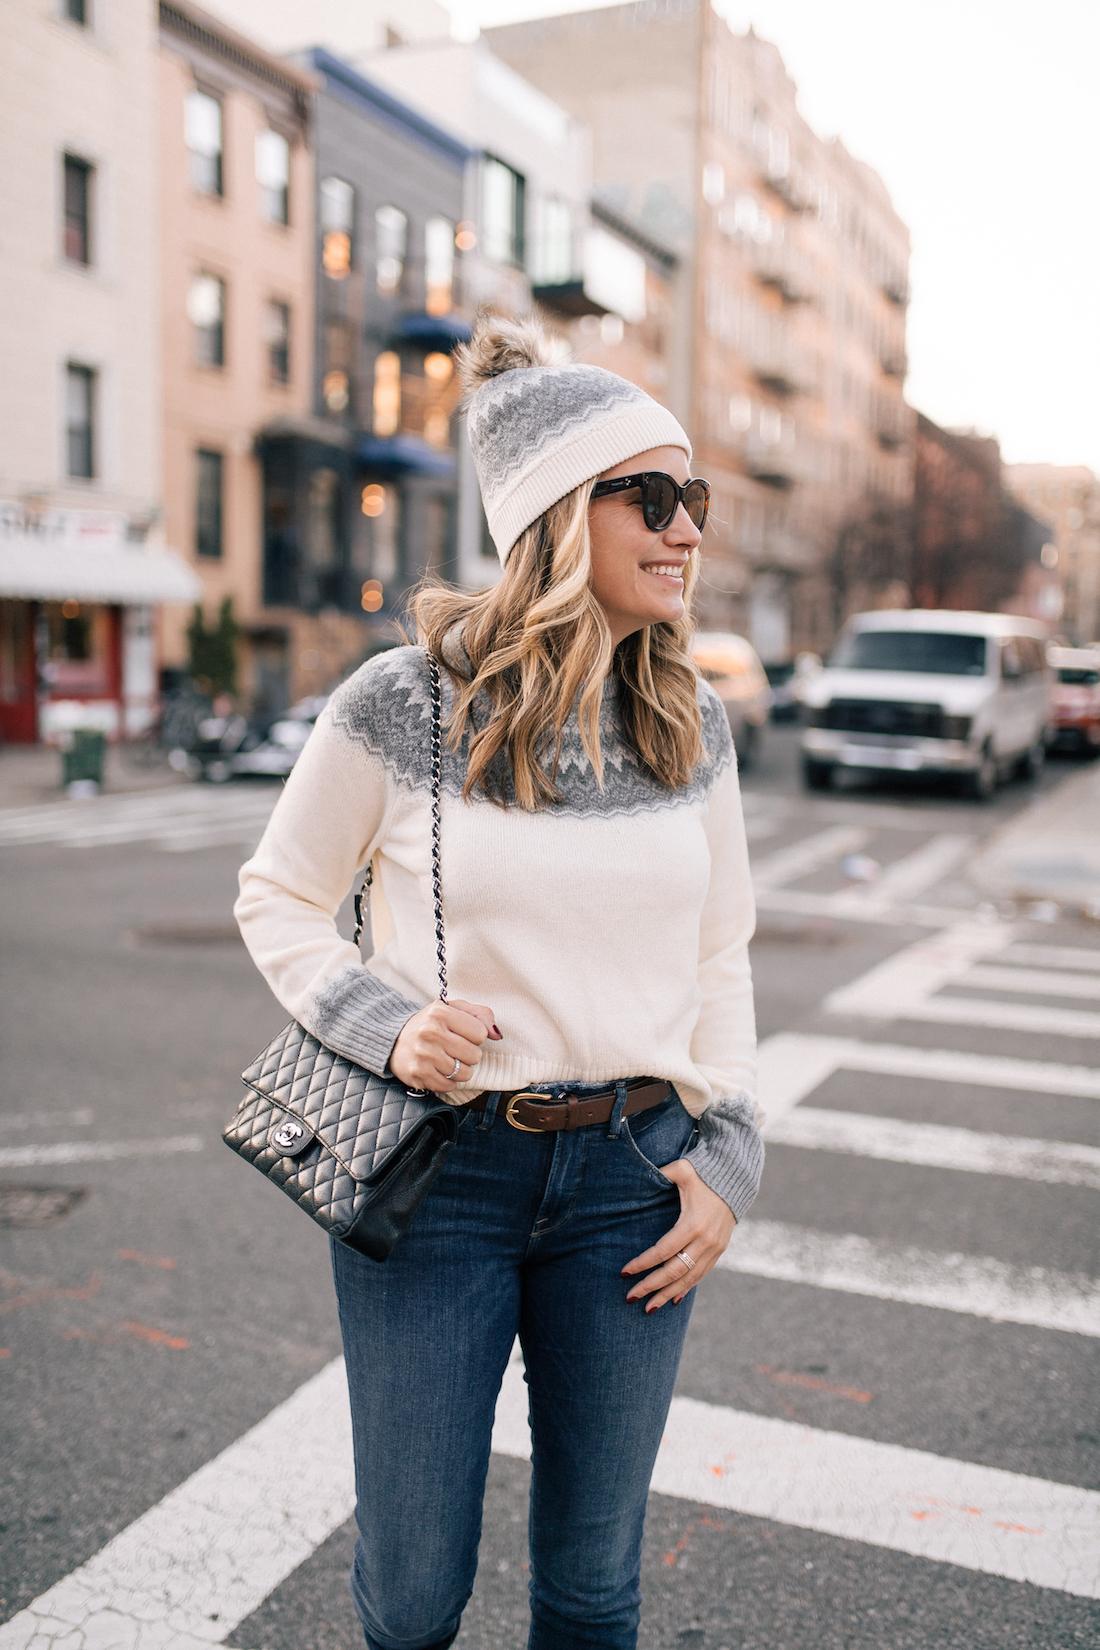 Vineyard Vines Sweater + Hat (c/o) // Good American Jeans // Chanel Purse // Polaroid Sunglasses